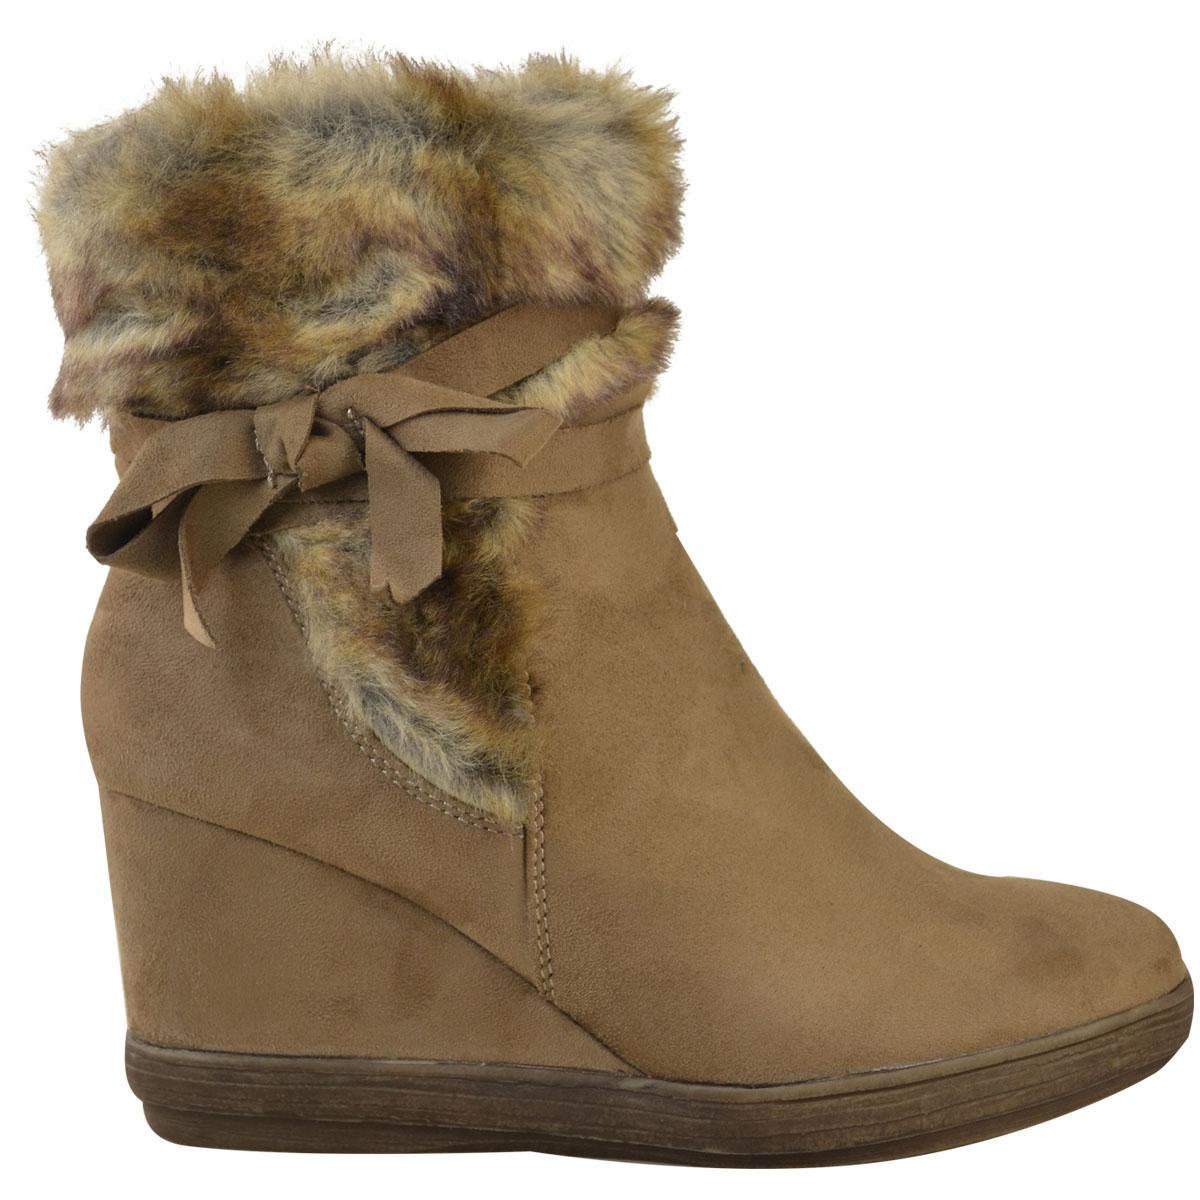 Womens-Ladies-Wedge-Low-Heel-Winter-Knee-Boots-Warm-Faux-Fur-Fleece-Size-UK thumbnail 25